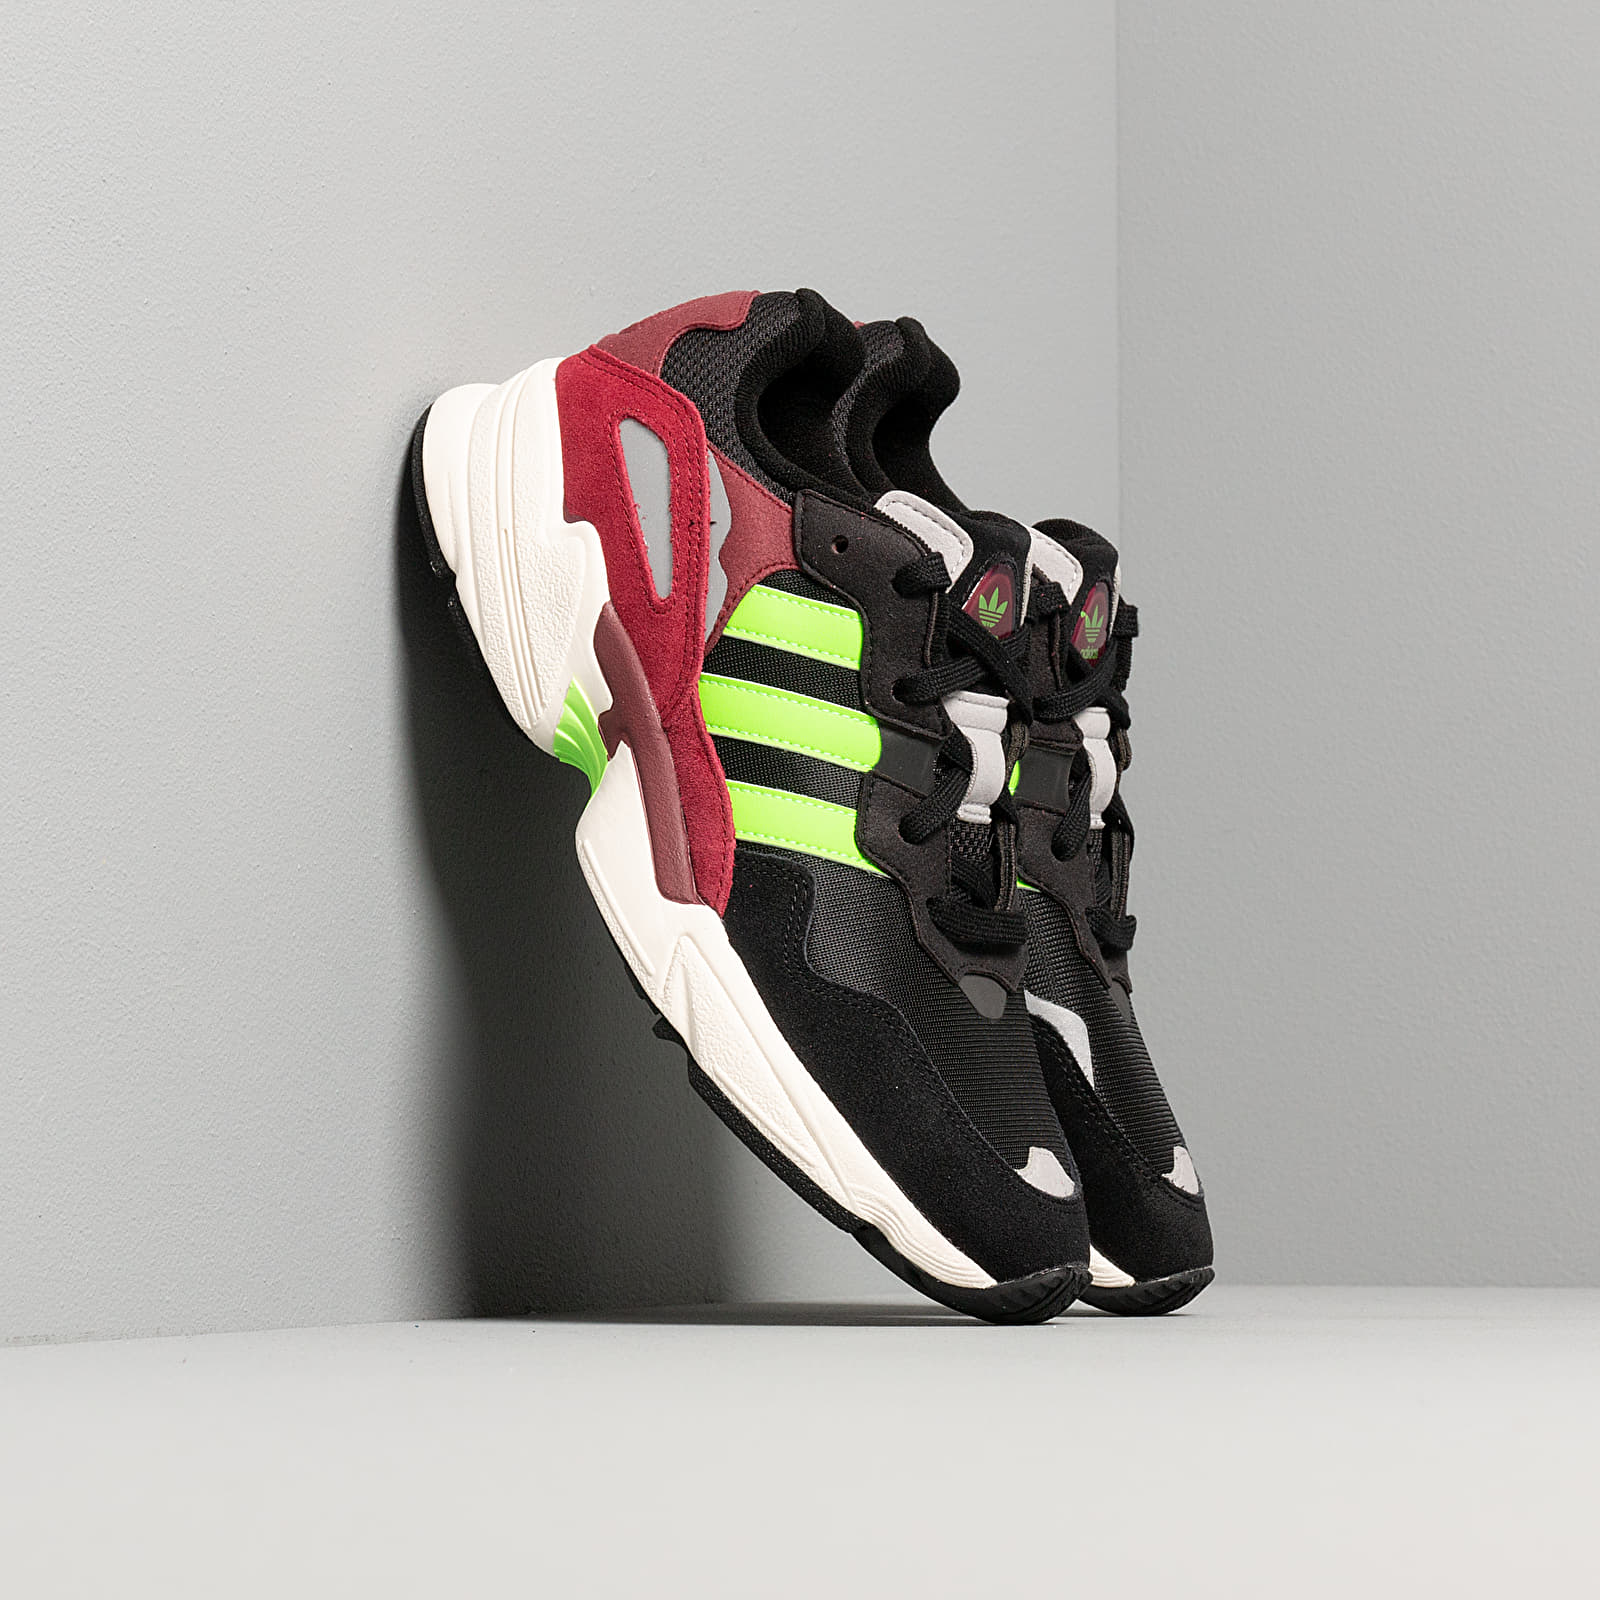 Men's shoes adidas Yung-96 Core Black